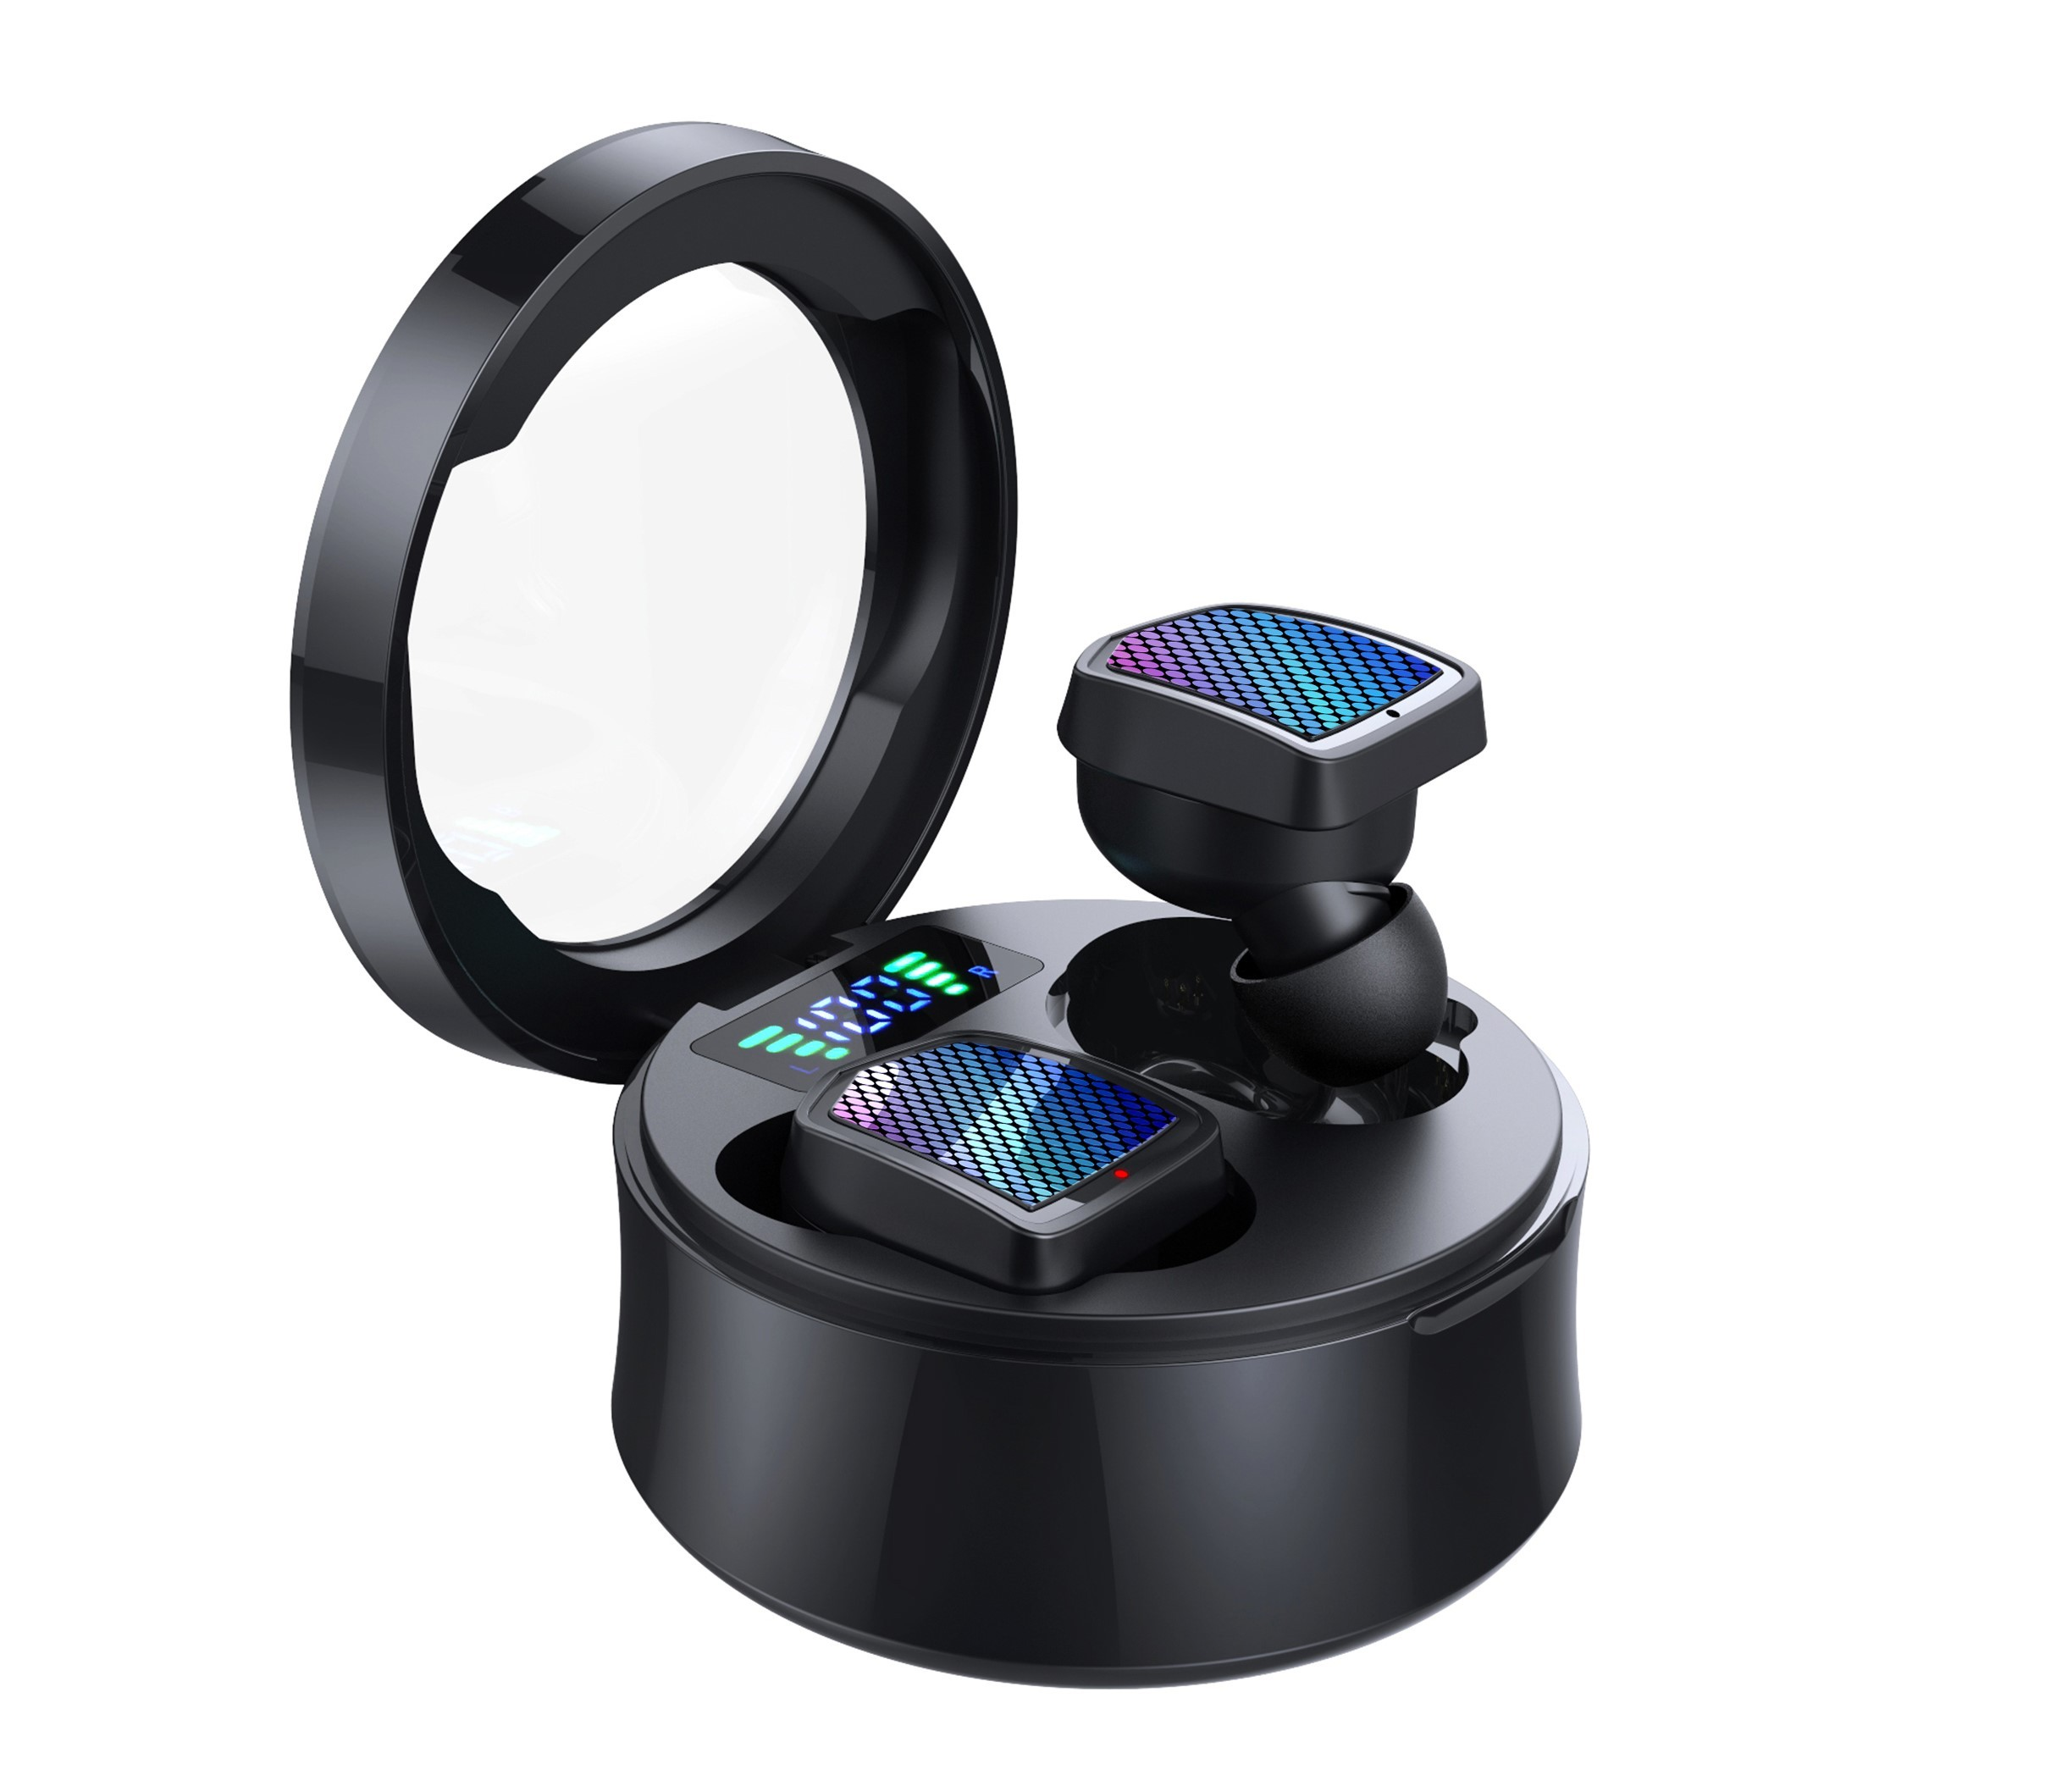 Casti Smart Techstar® TWS S30, Wireless, Bluetooth V5.0, IPX6, HD Audio, Touch, iOS, Android, Type-C, Negru